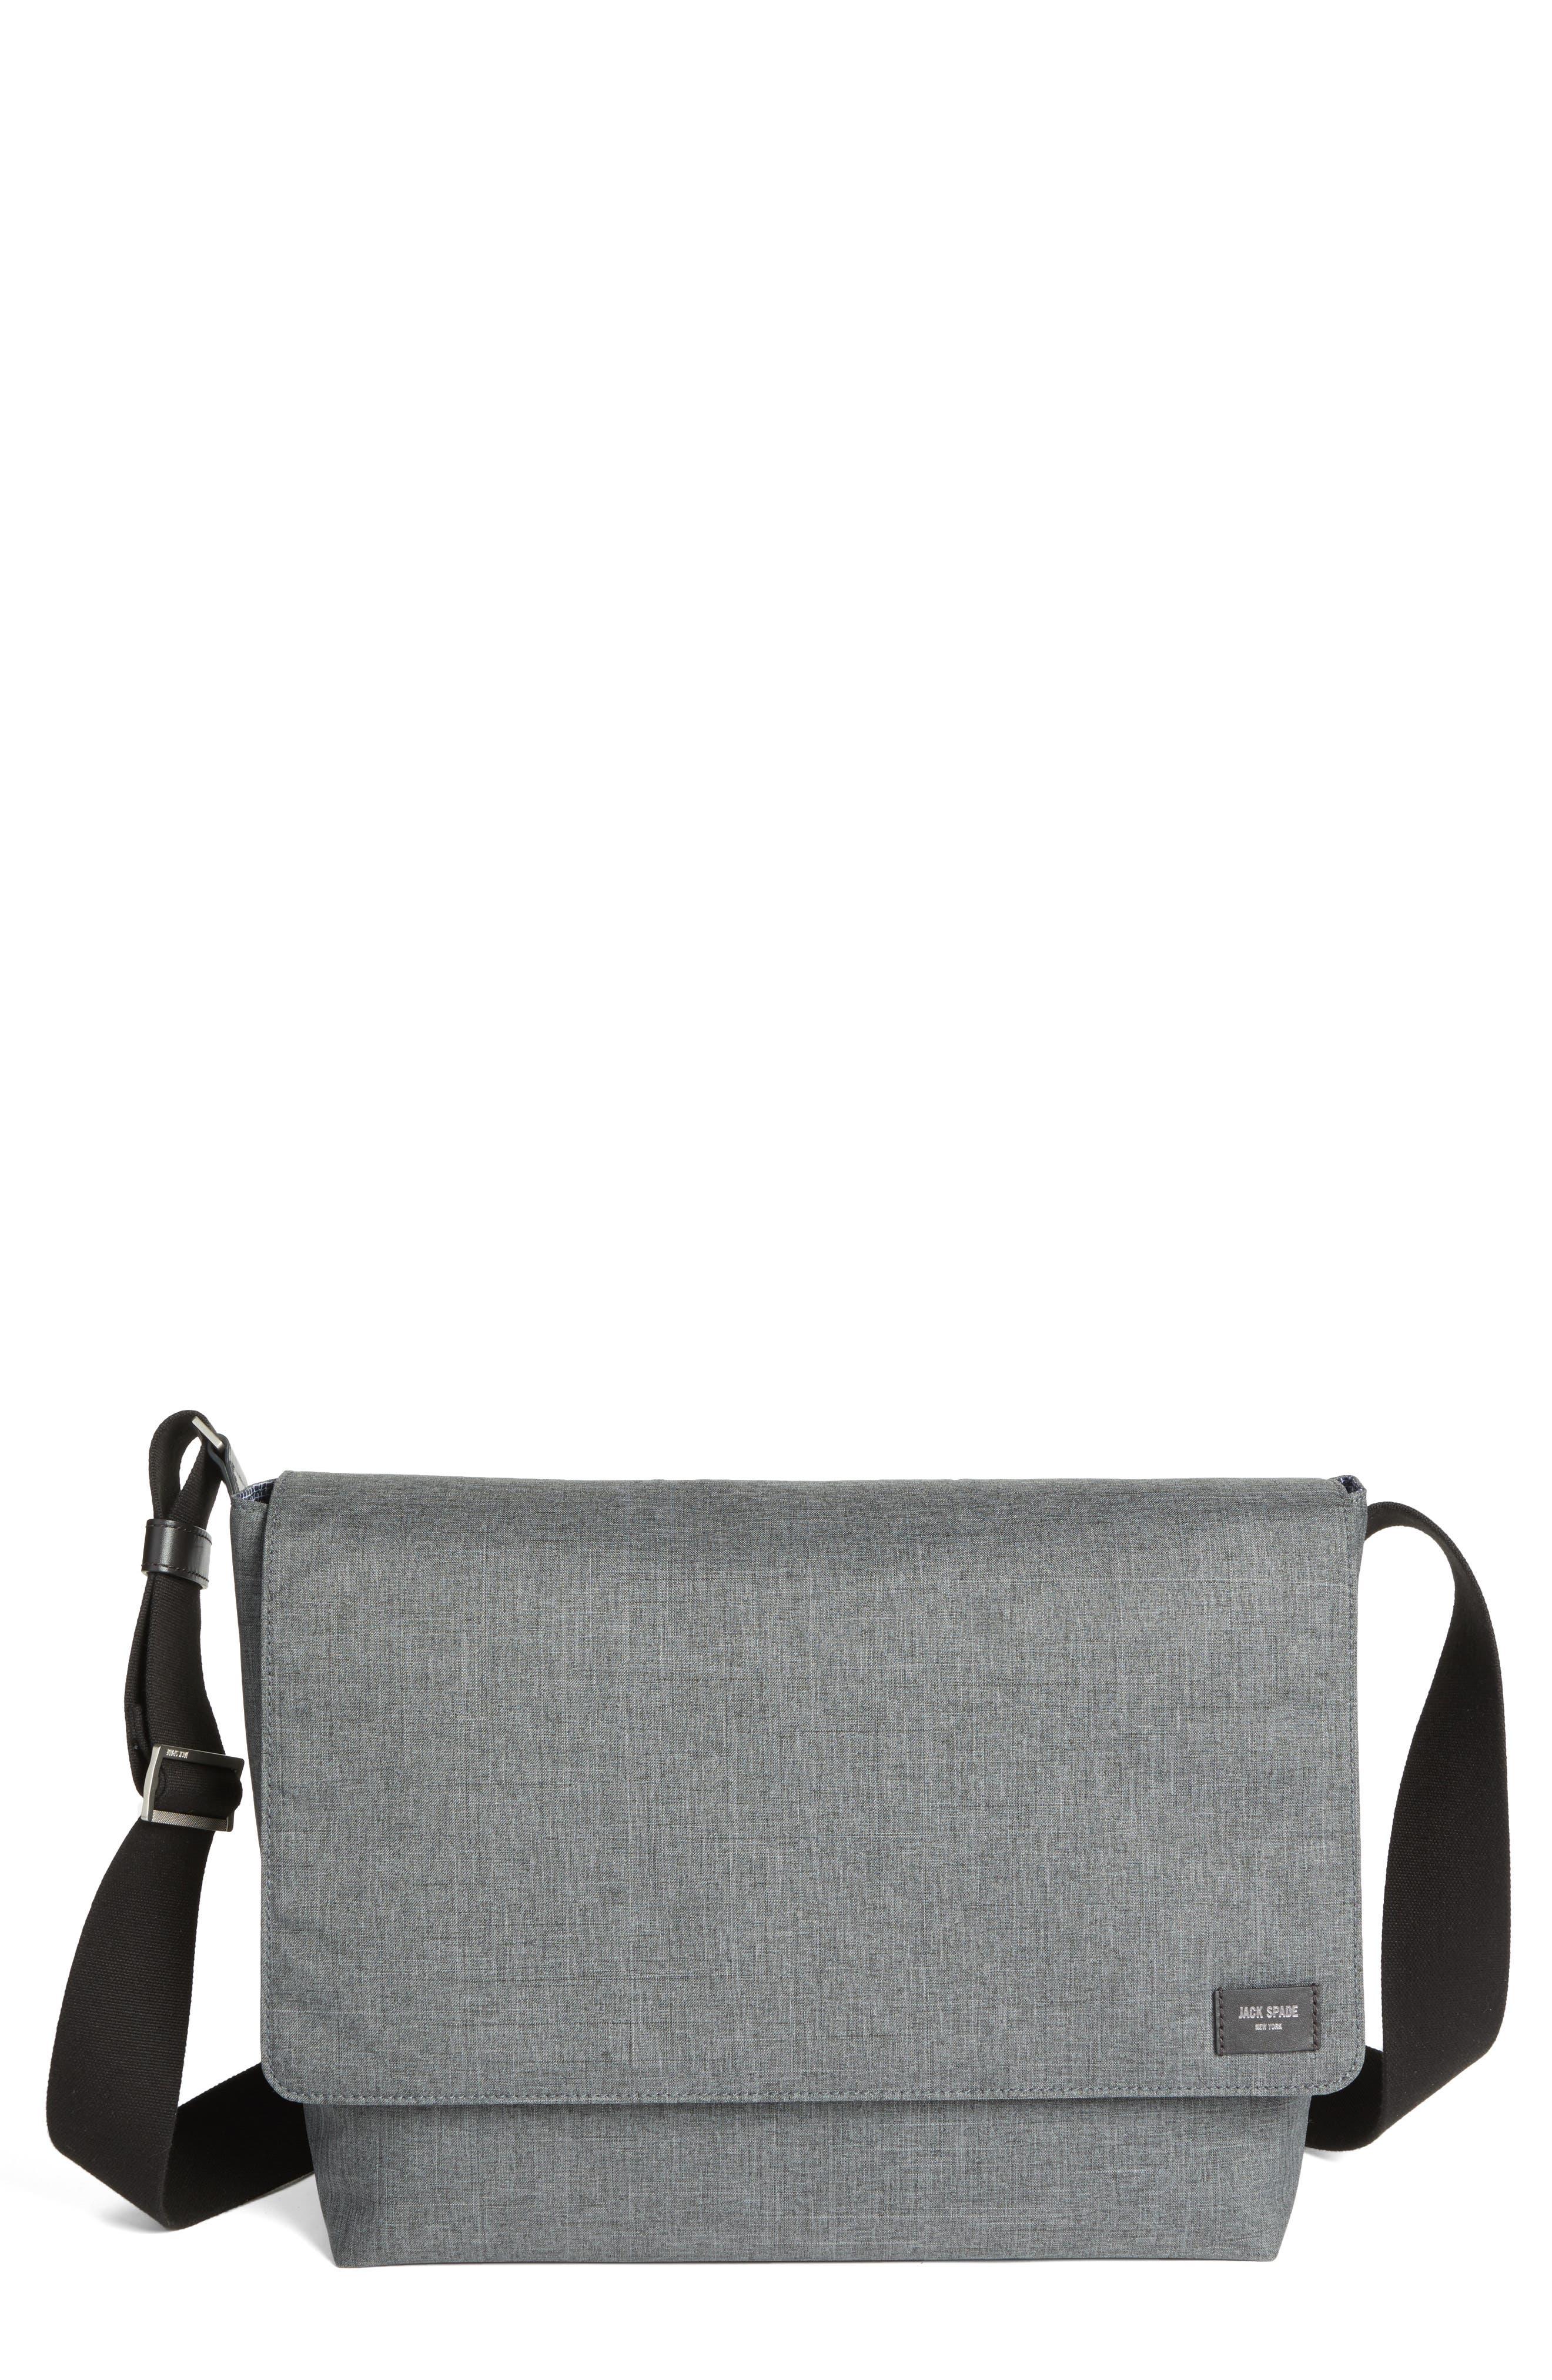 Tech Oxford Messenger Bag,                             Main thumbnail 1, color,                             020